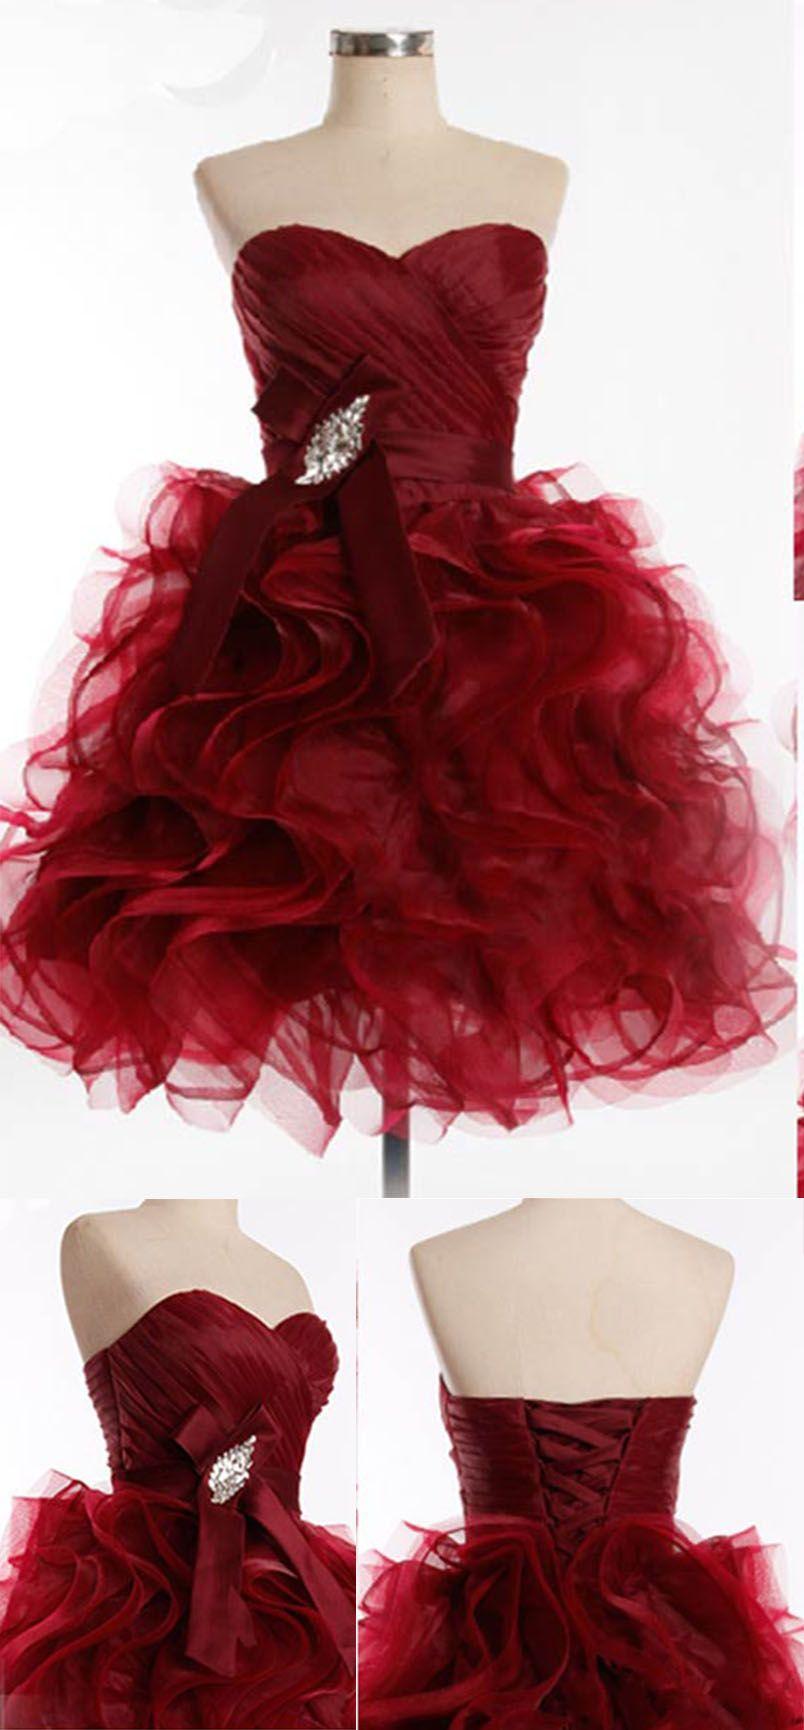 Homecoming dresses homecoming dresswine red homecoming dress